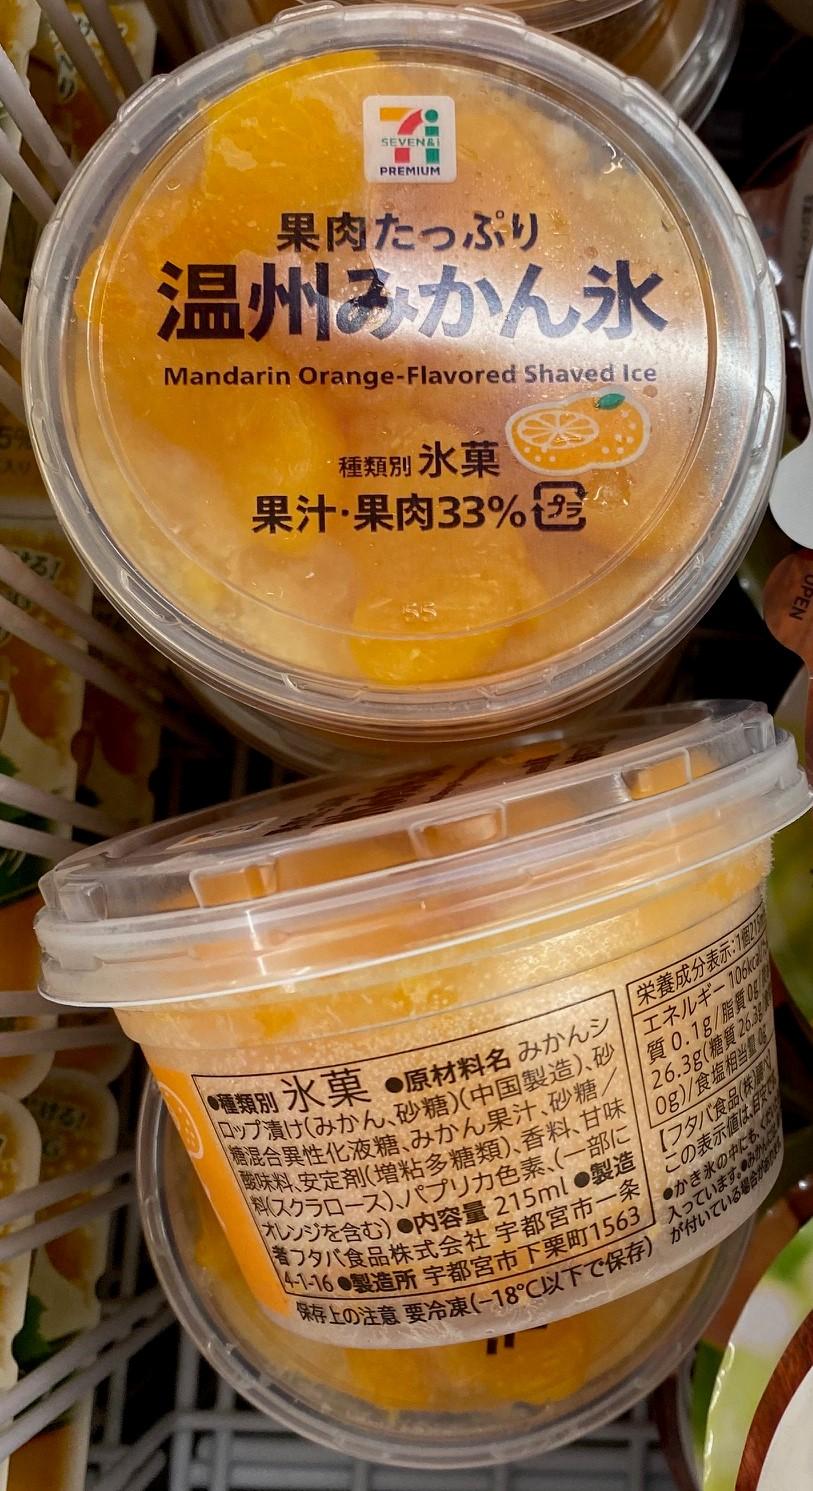 7-11 Mandarin Orange-Flavored Shaved Ice